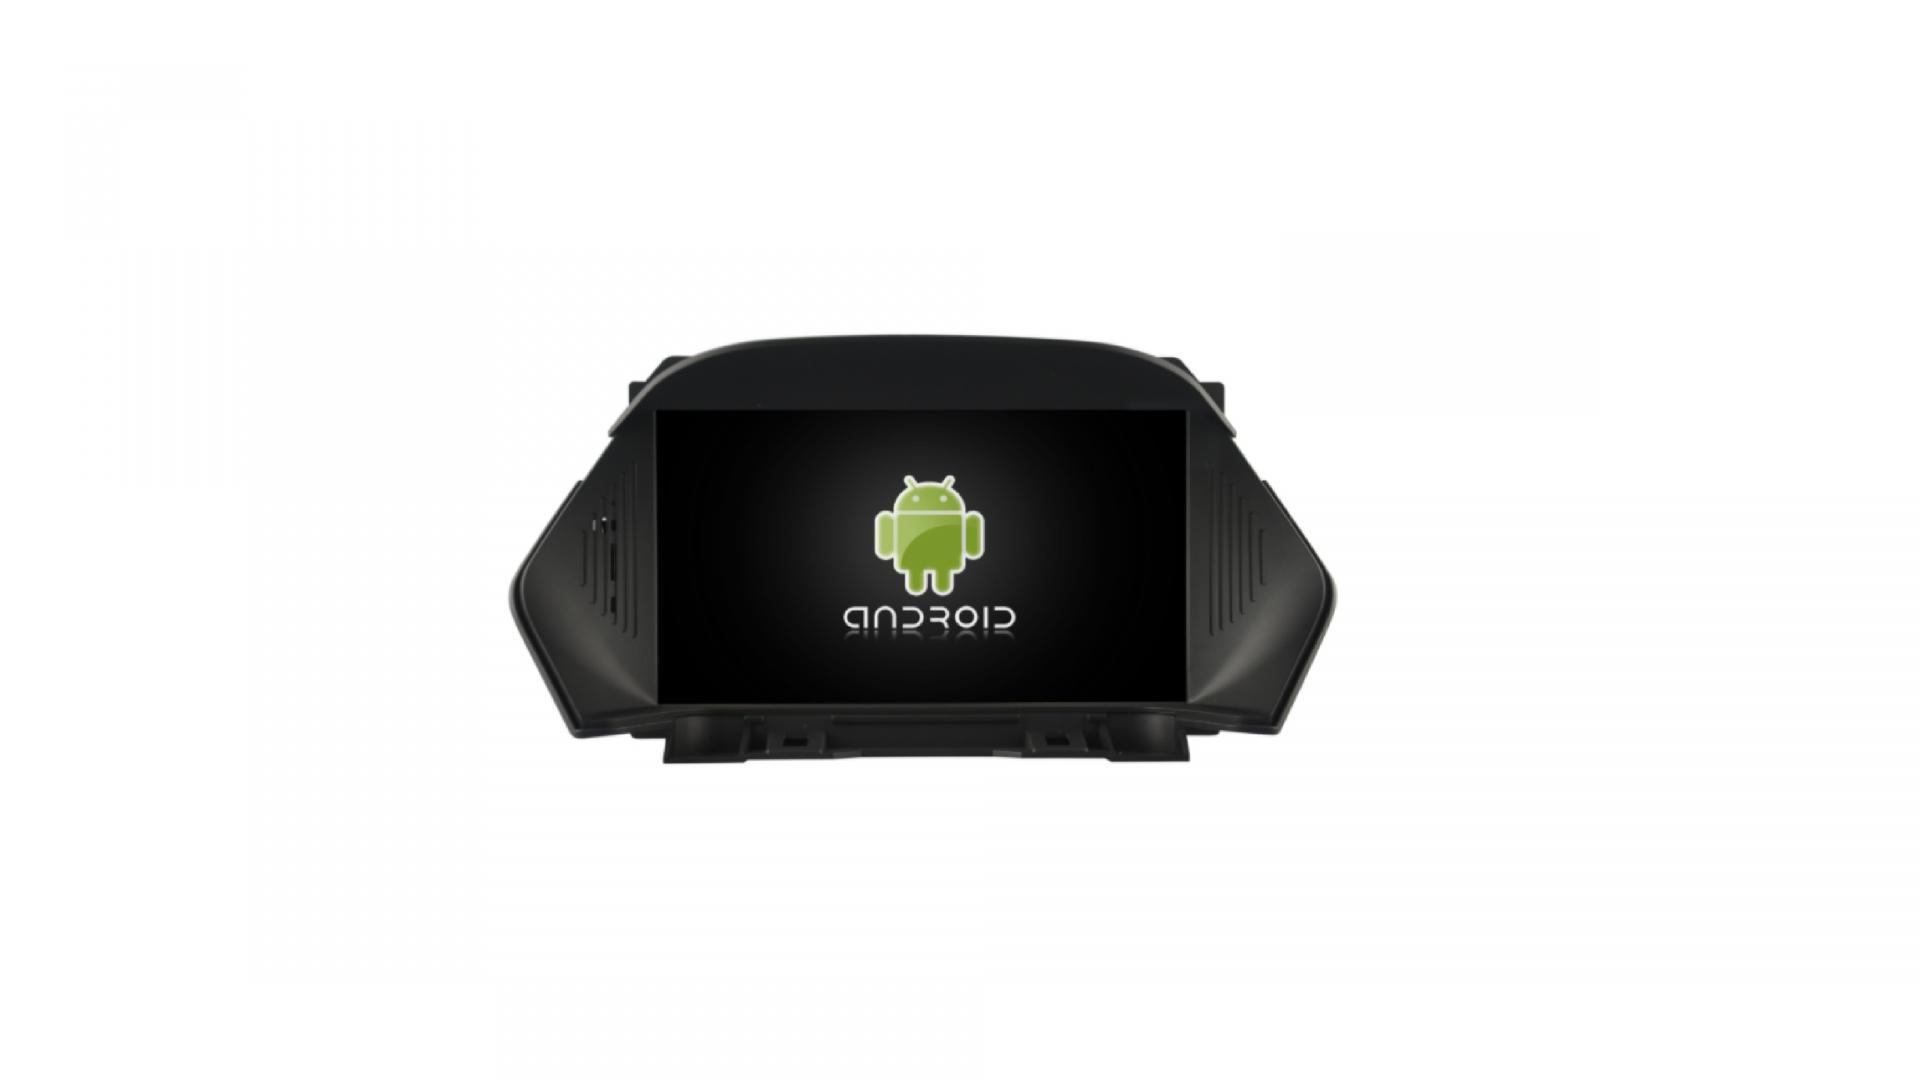 Autoradio gps bluetooth ford kuga mustang explorer edge fusion focus android camera de recul commande au volant ipod tv dvbt 3g 4g pas cher wifi poste usb sd tnt double 2 din canbu